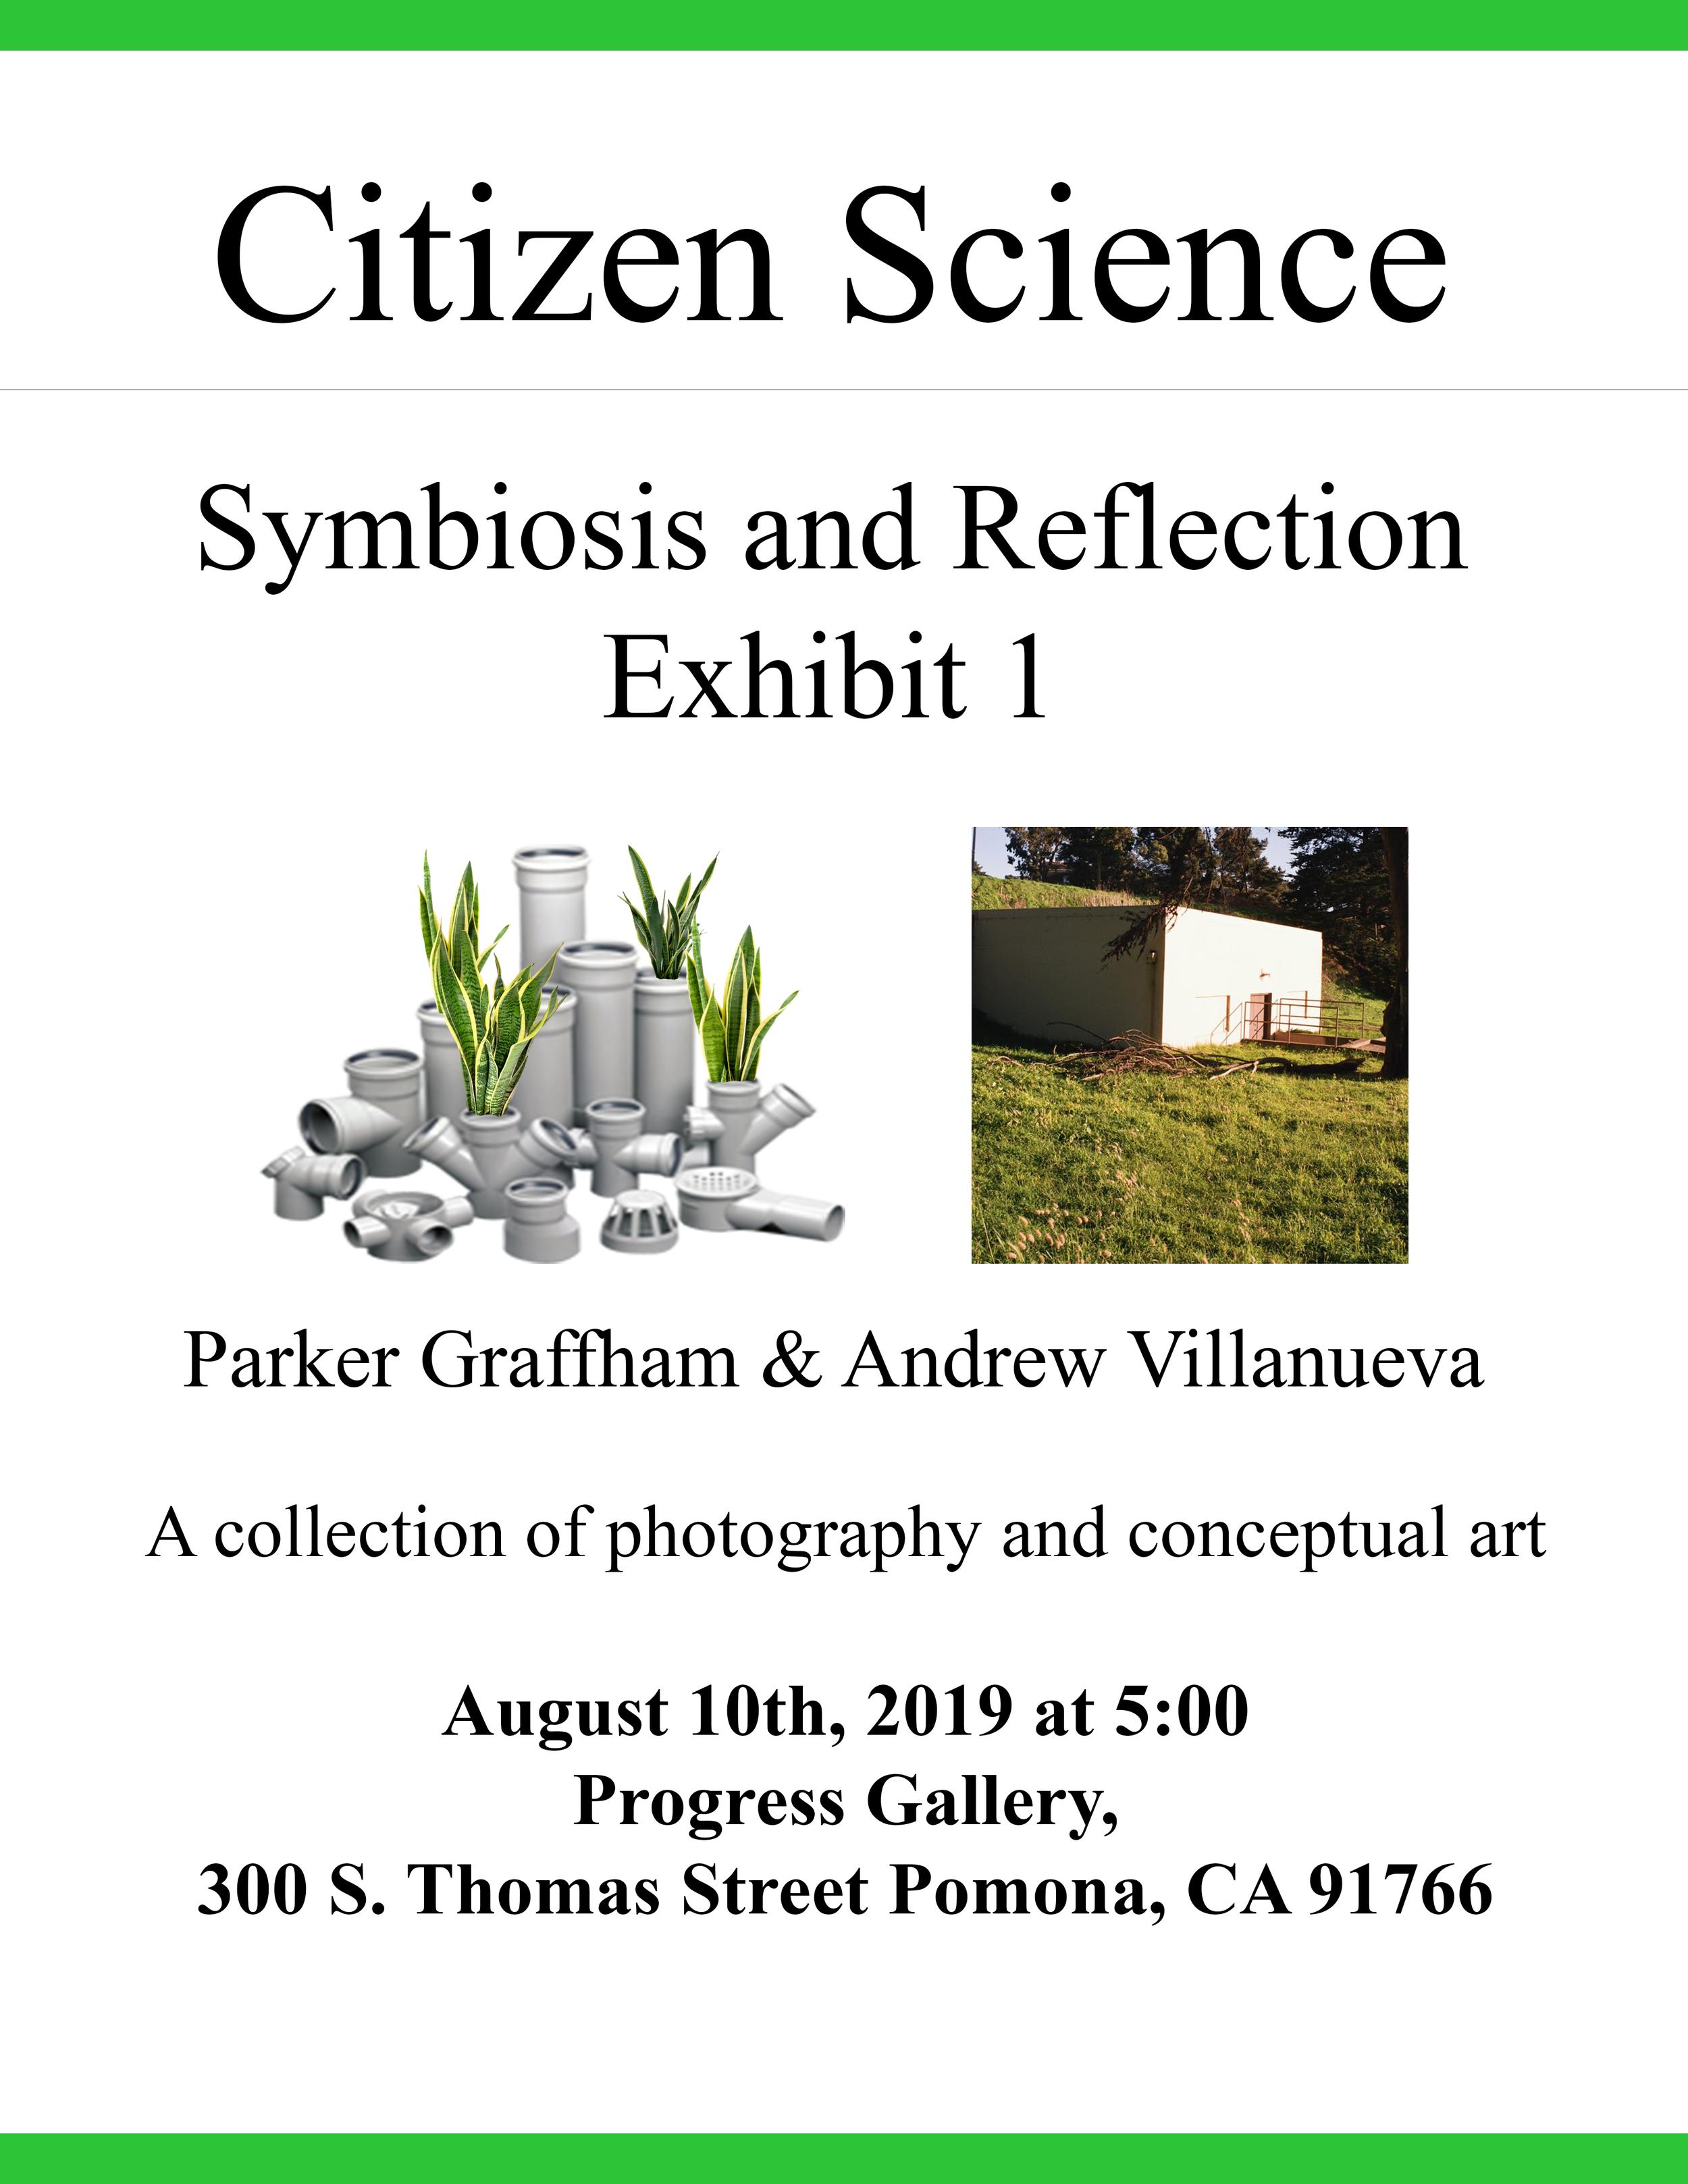 Progress Gallery